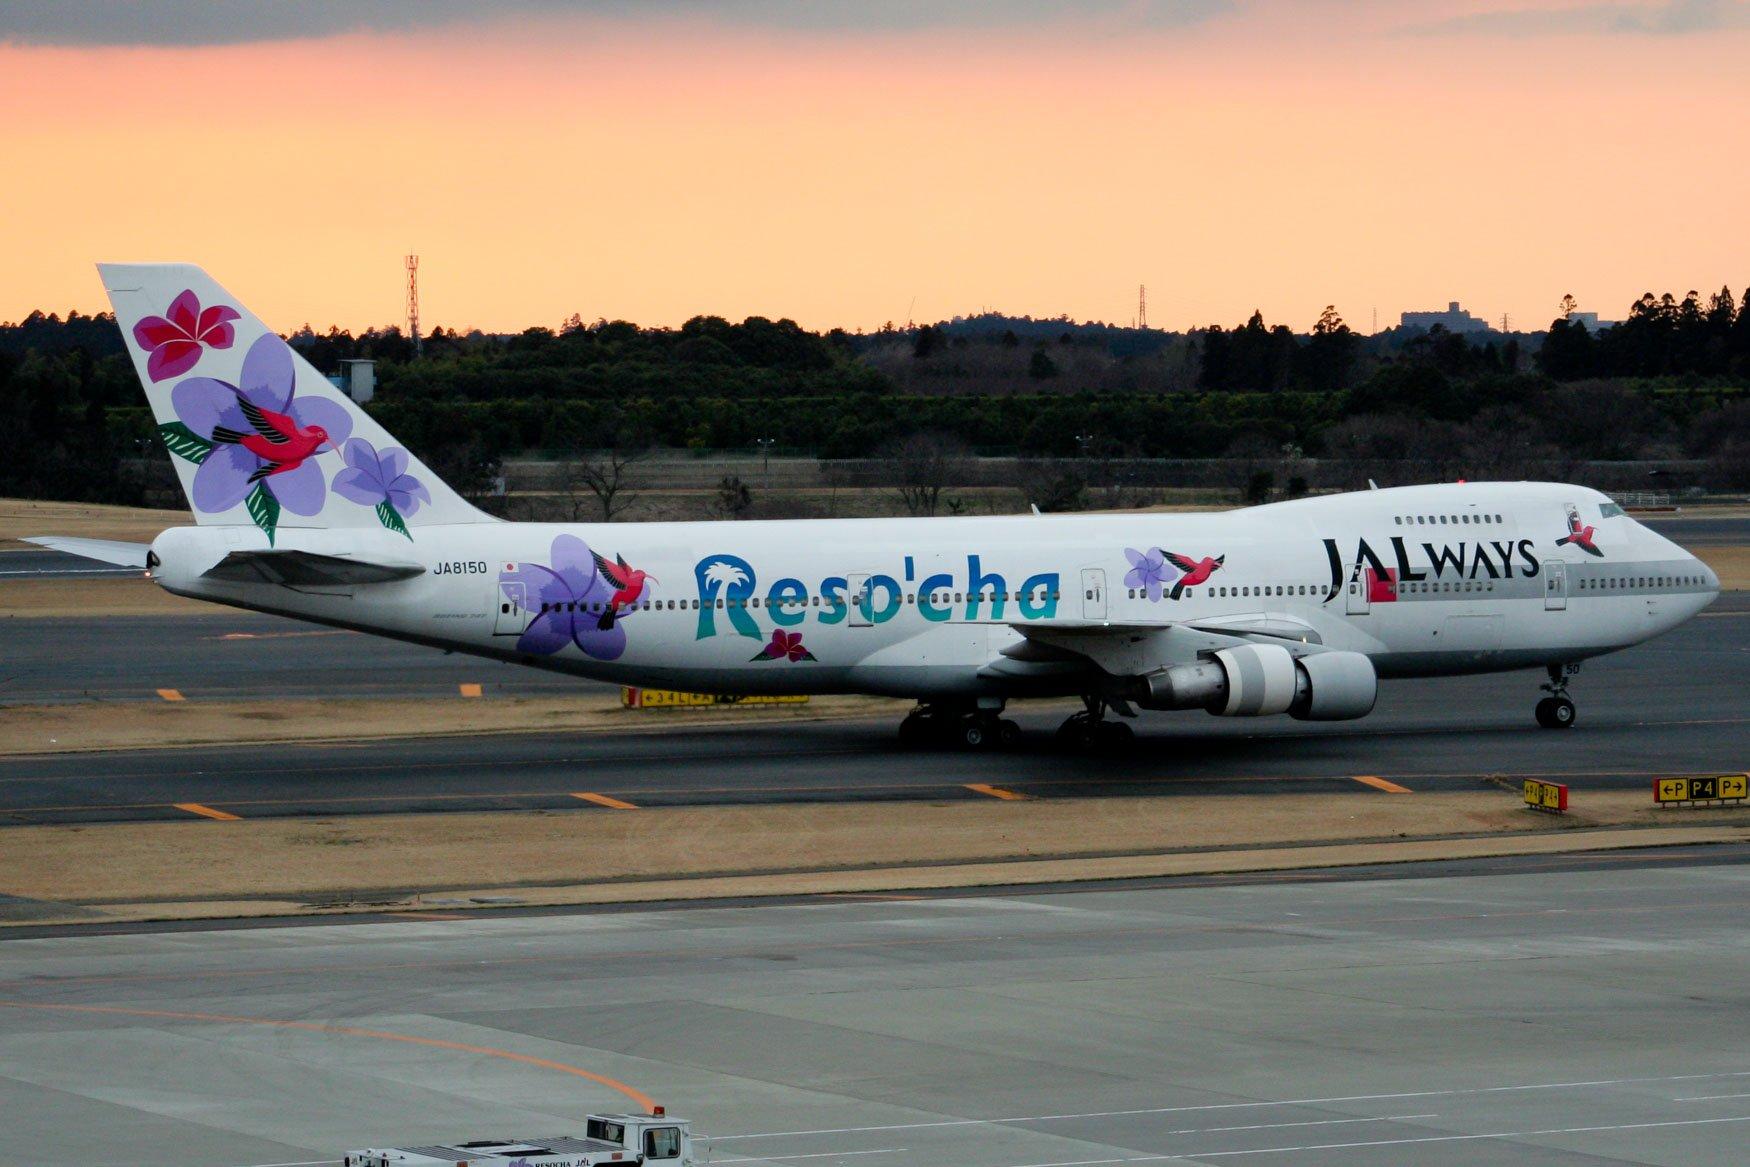 JALways 747-200